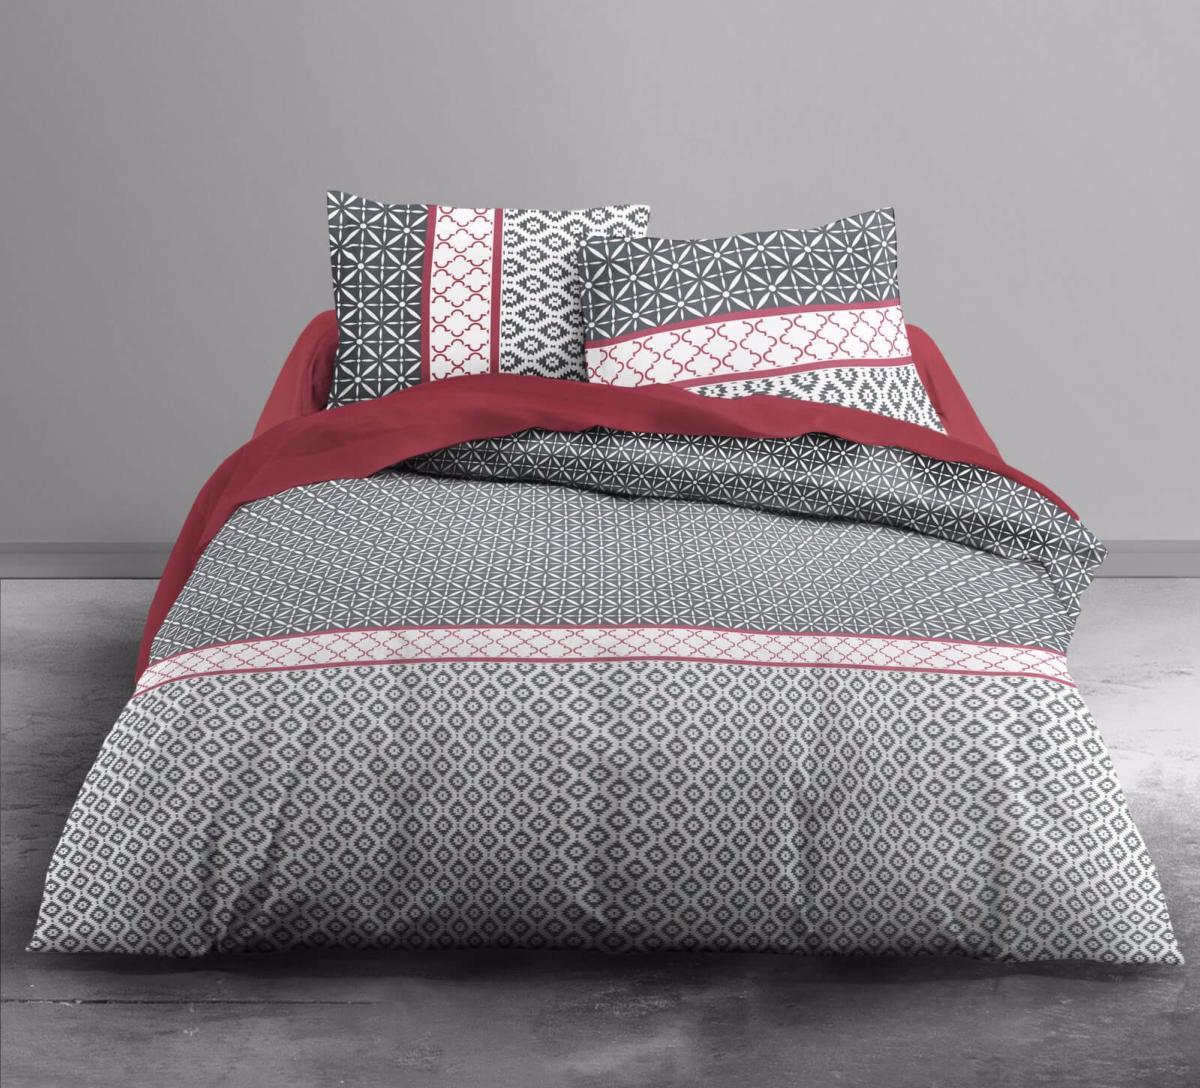 housse de couette kothlys j k markets. Black Bedroom Furniture Sets. Home Design Ideas